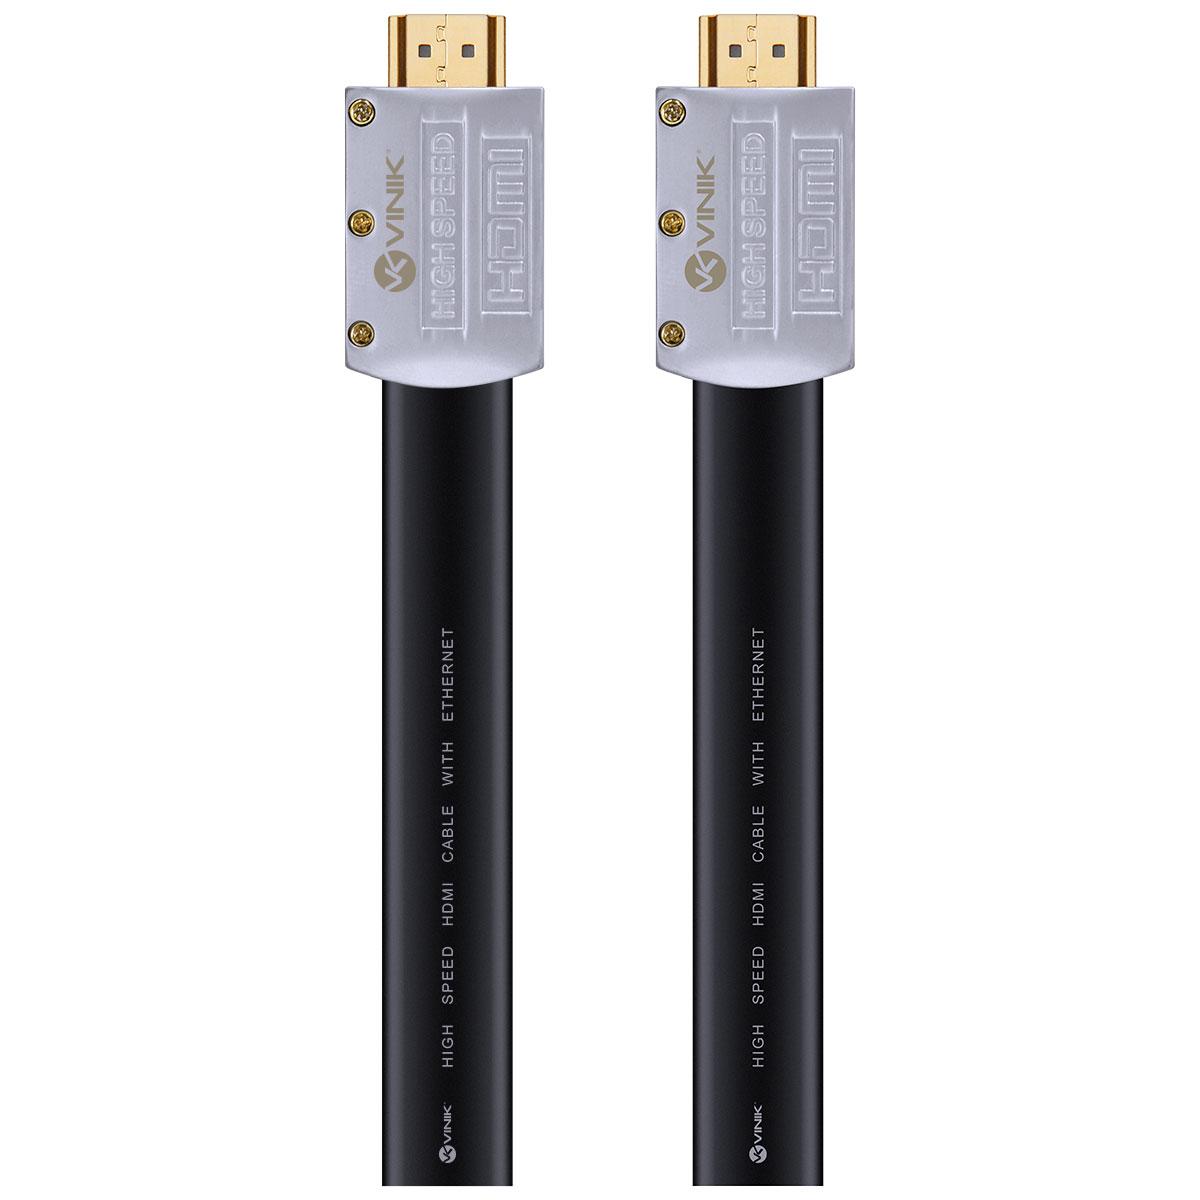 CABO HDMI 2.0 4K ULTRA HD 3D CONEXÃO ETHERNET FLAT COM CONECTOR DESMONTÁVEL 3 METROS - H20FL-3